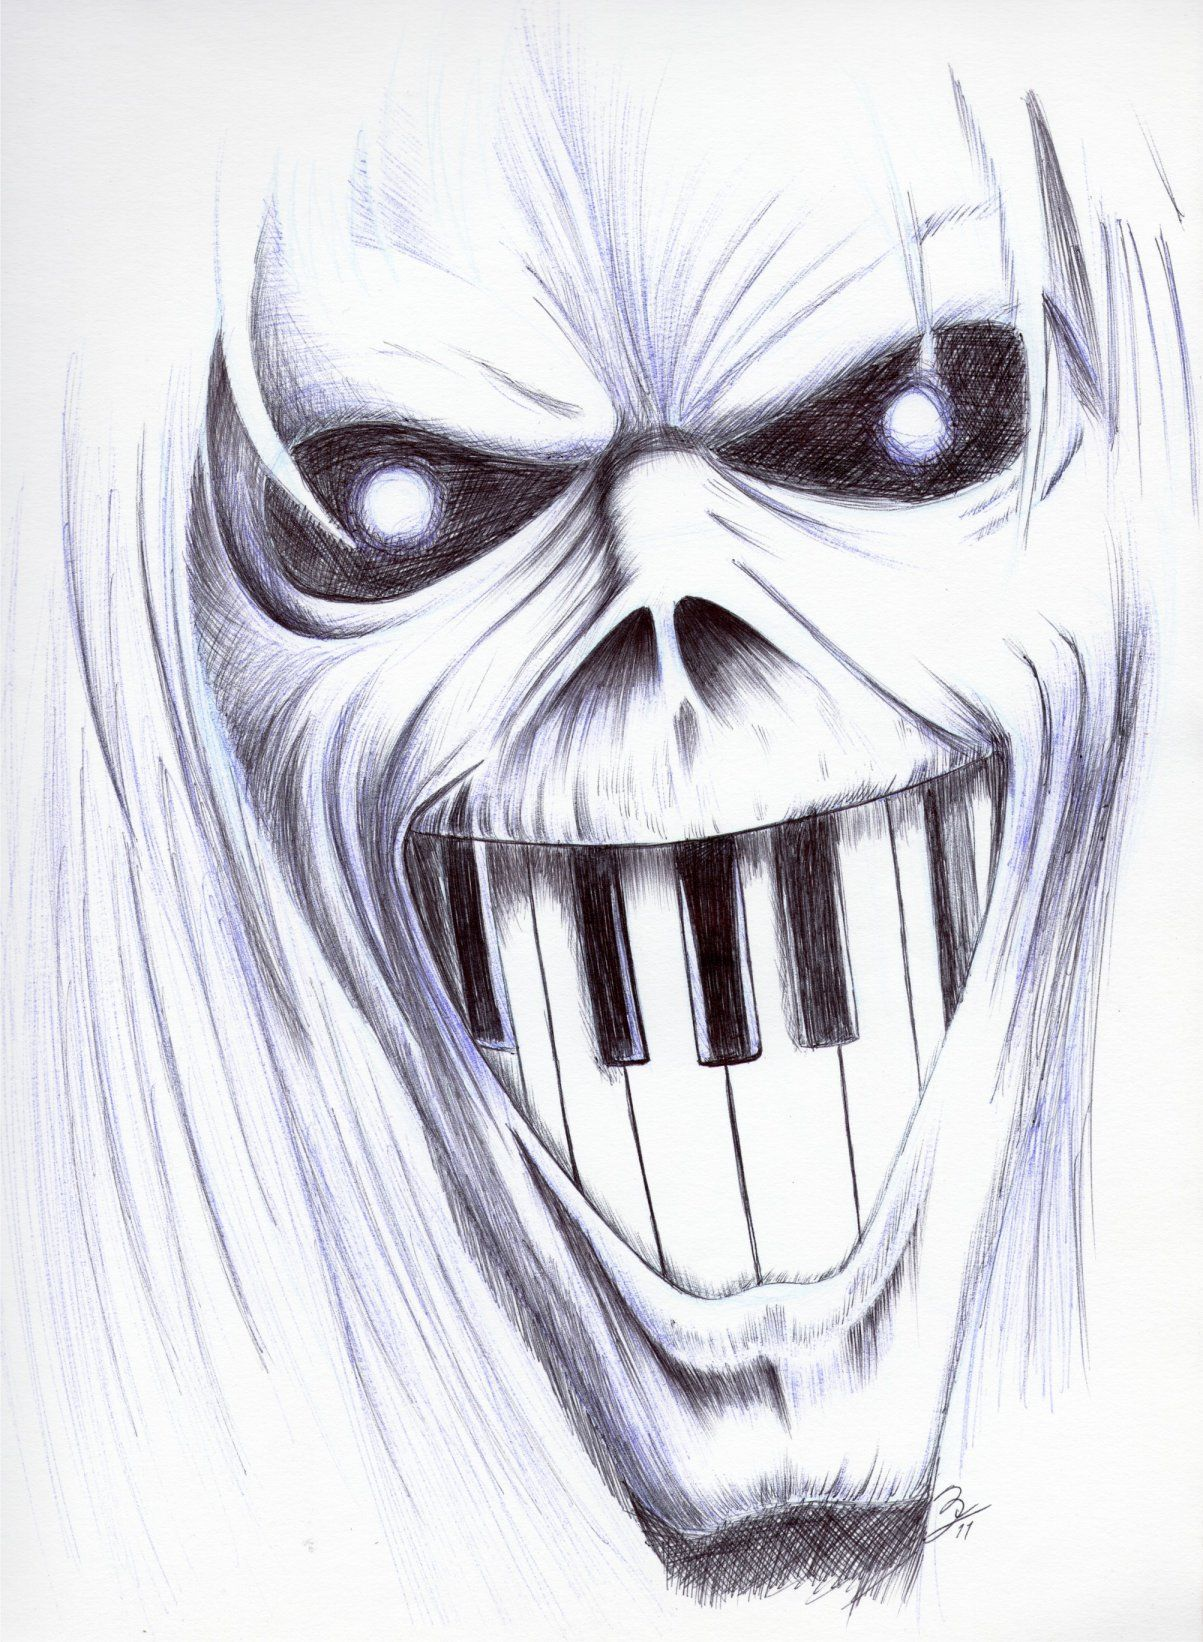 Eddie Iron Maiden Dibujo Buscar Con Google Iron Maiden Eddie Iron Maiden Iron Maiden Tattoo